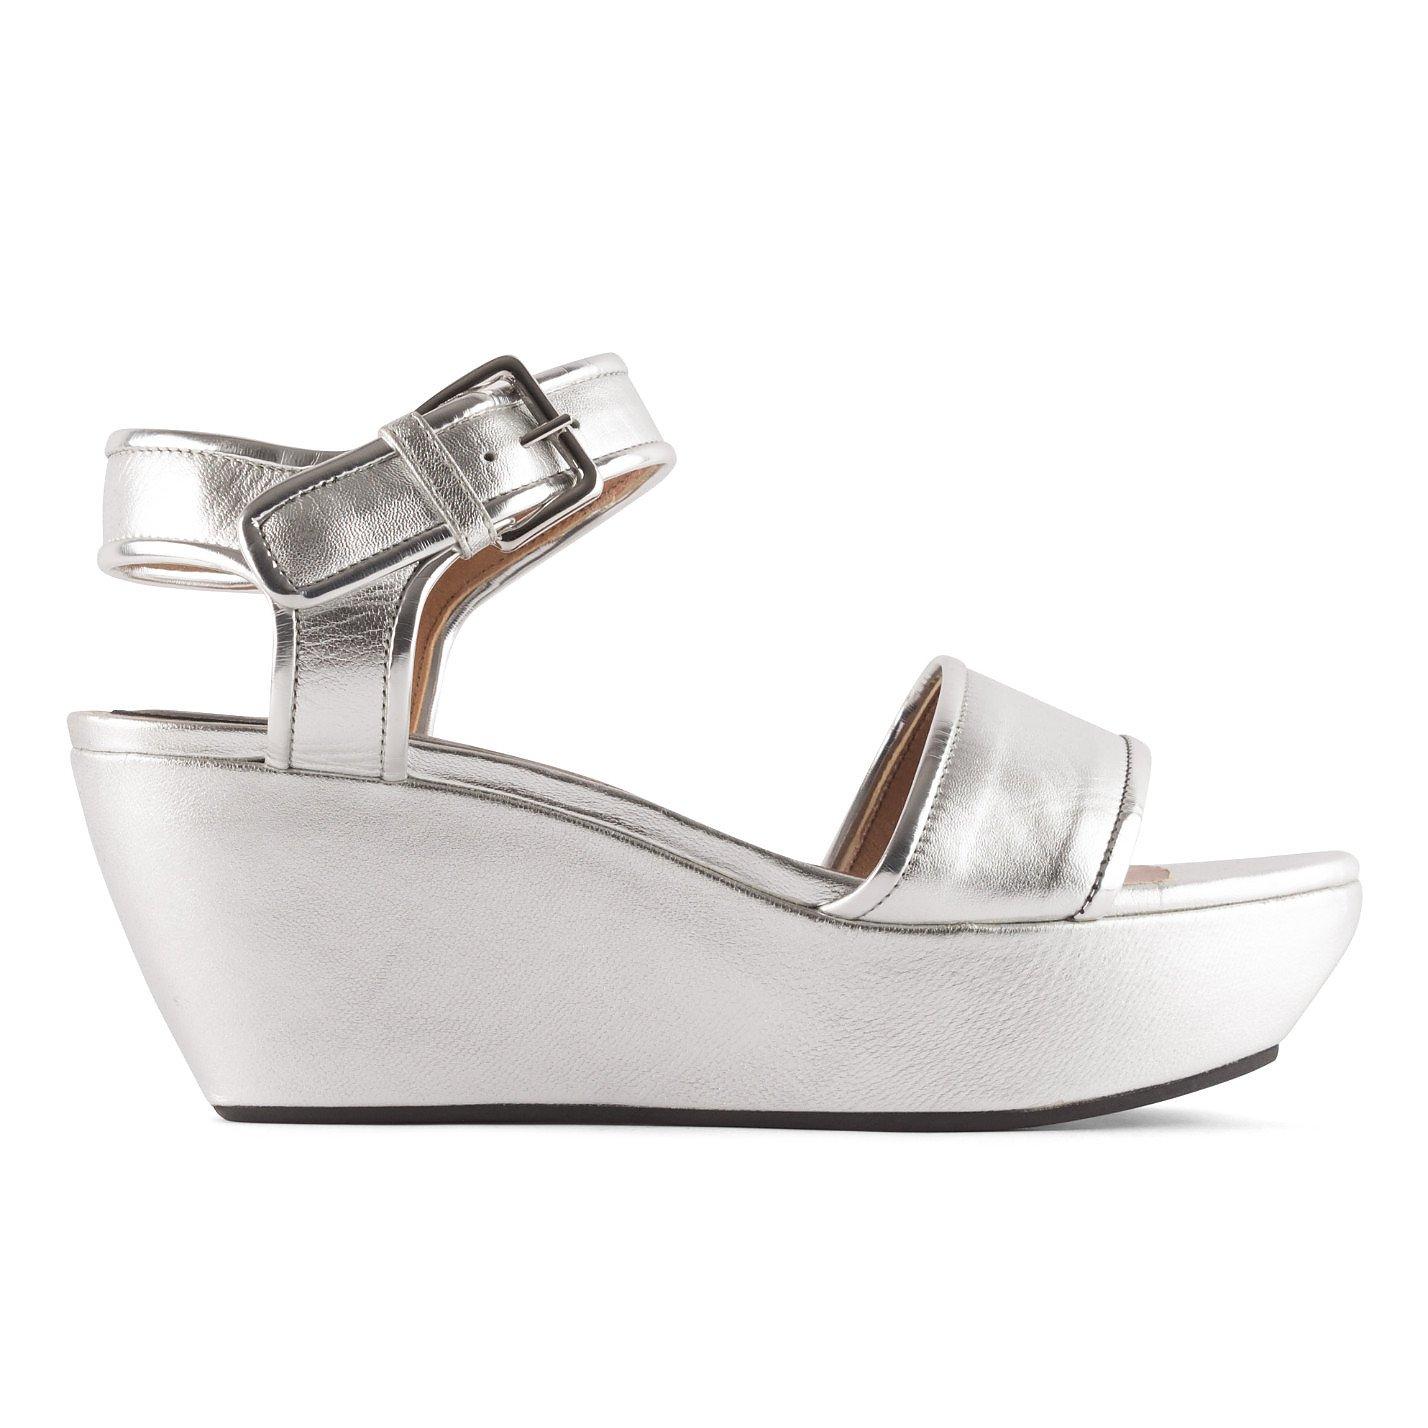 Marni Metallic Platform Wedge Sandals